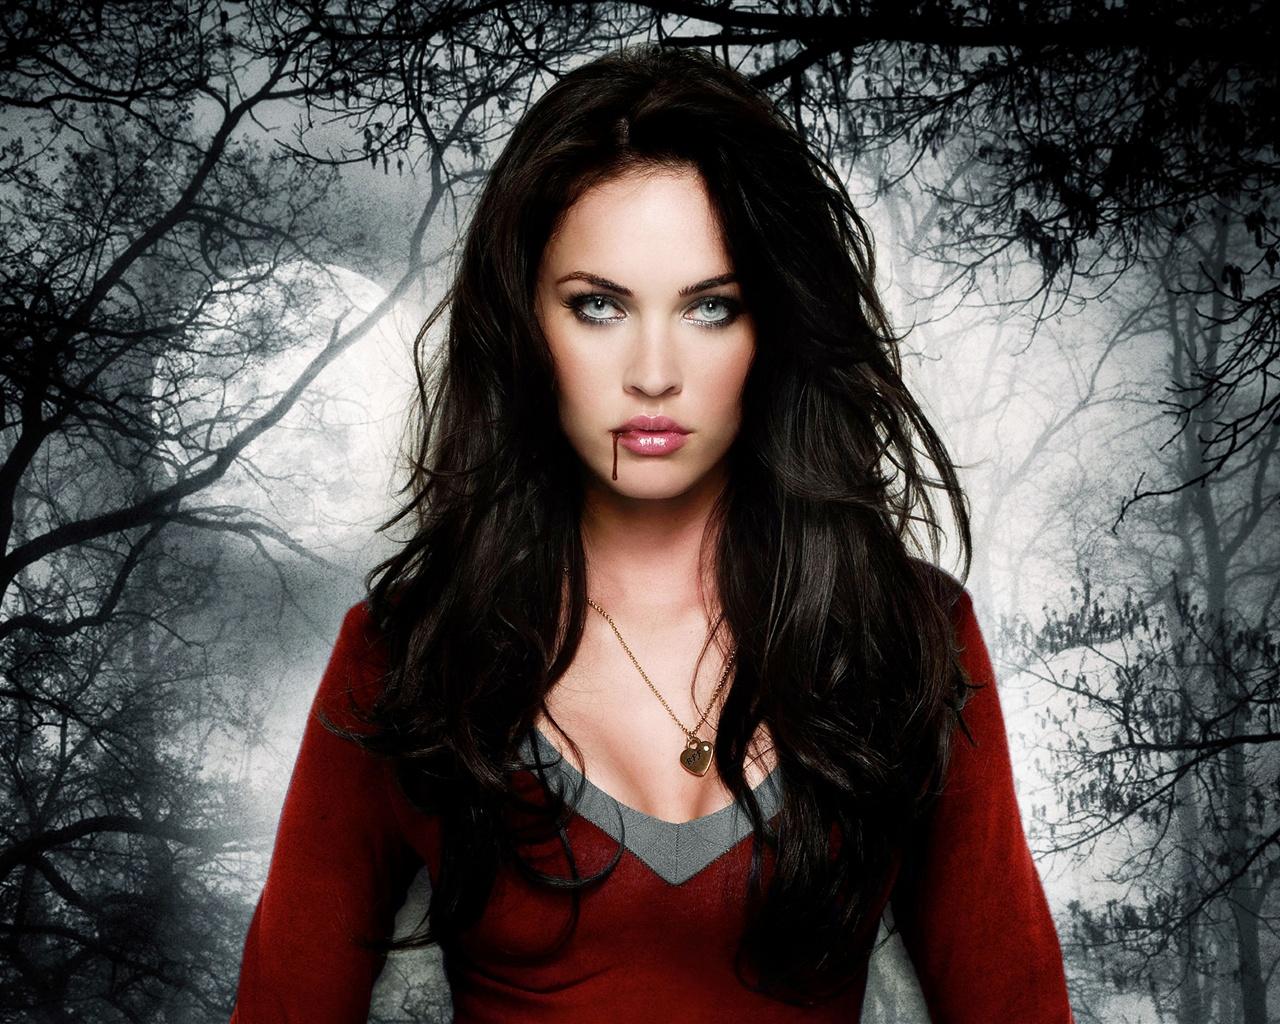 Megan Fox In Jennifers Body Movie Wallpaper 1280x1024 Pictures 1280x1024